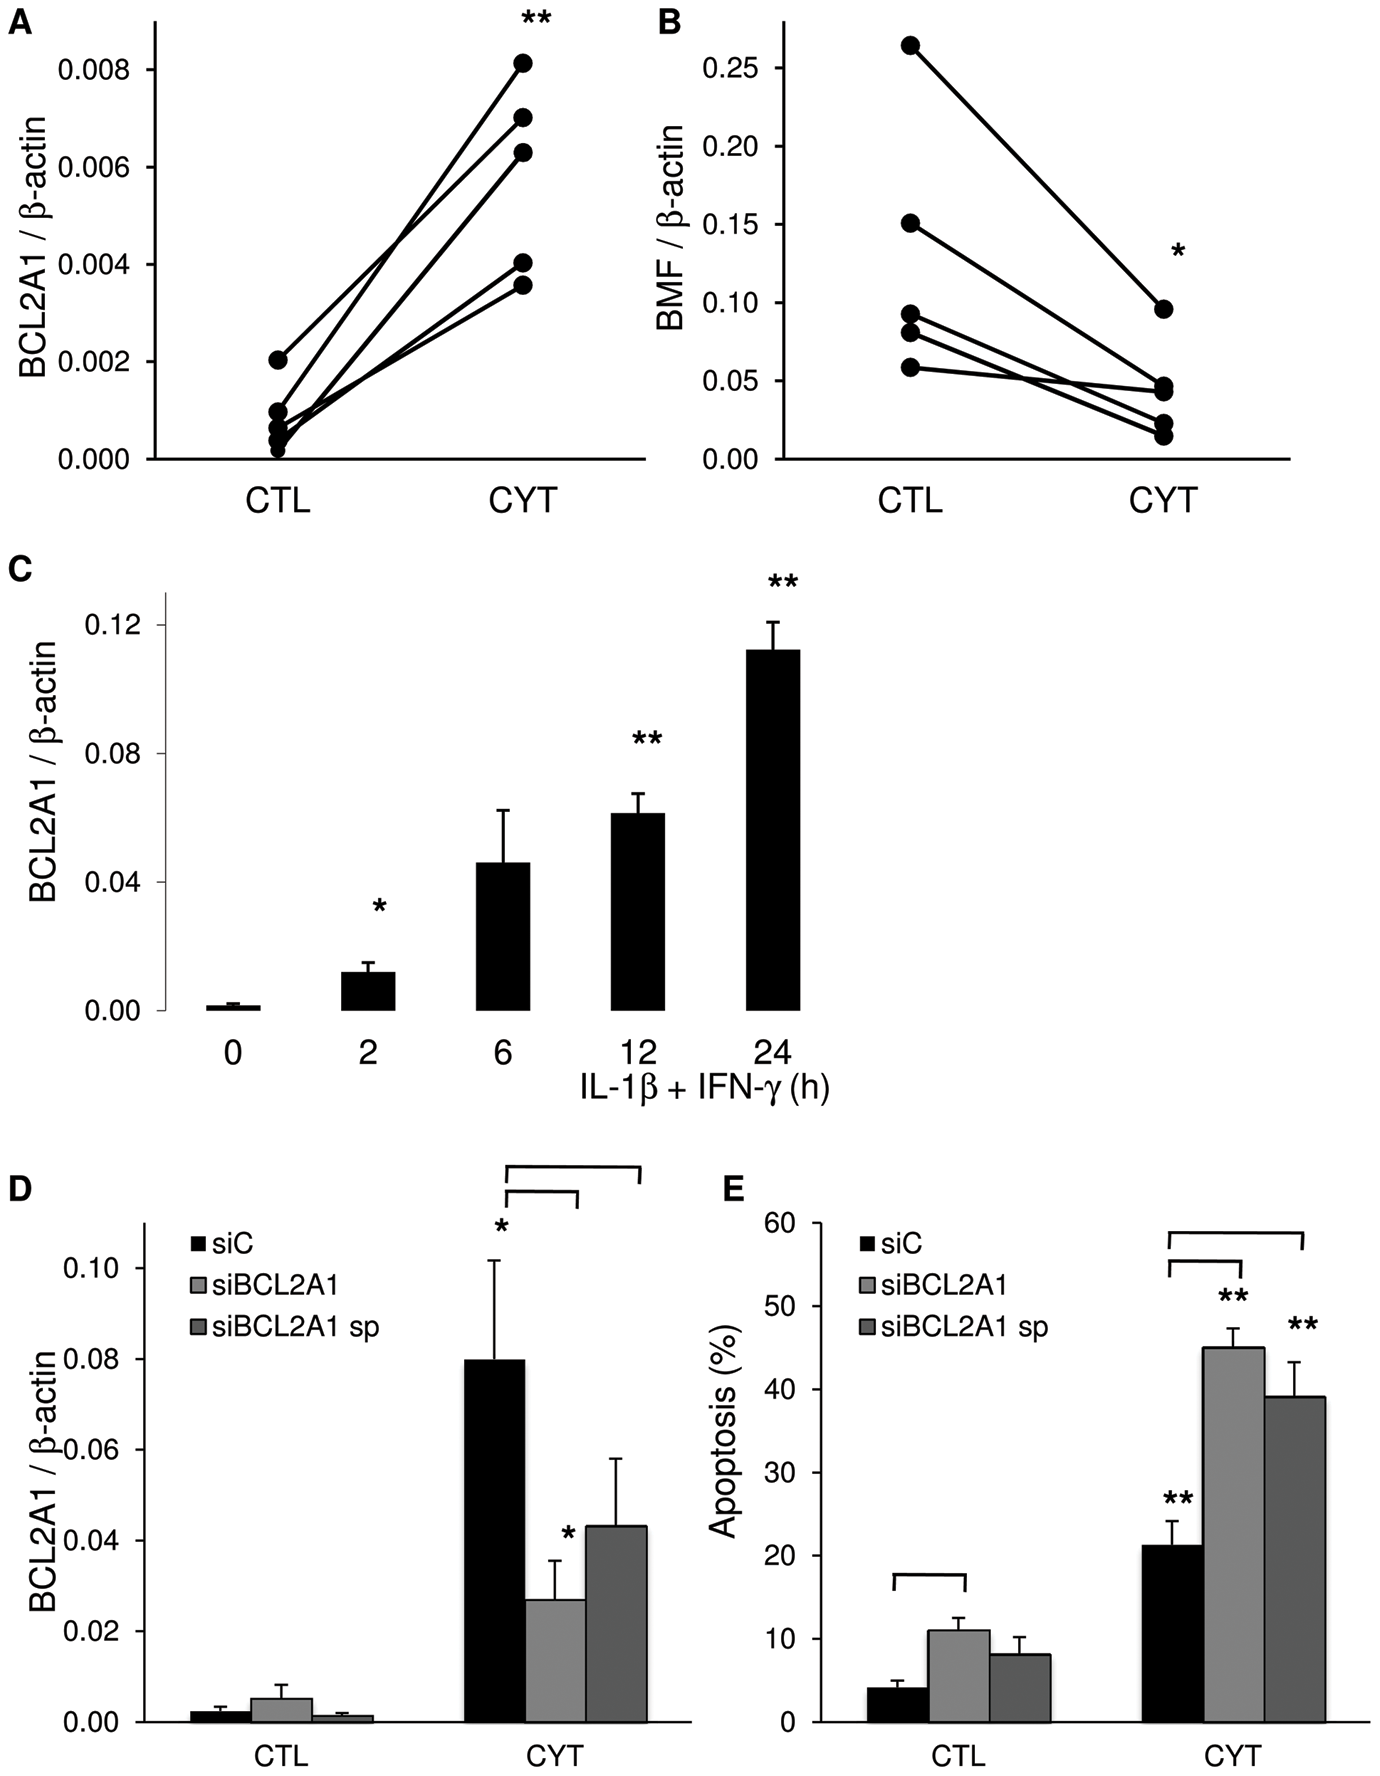 IL-1β+IFN-γ modifies BCL2A1 and BMF expression.